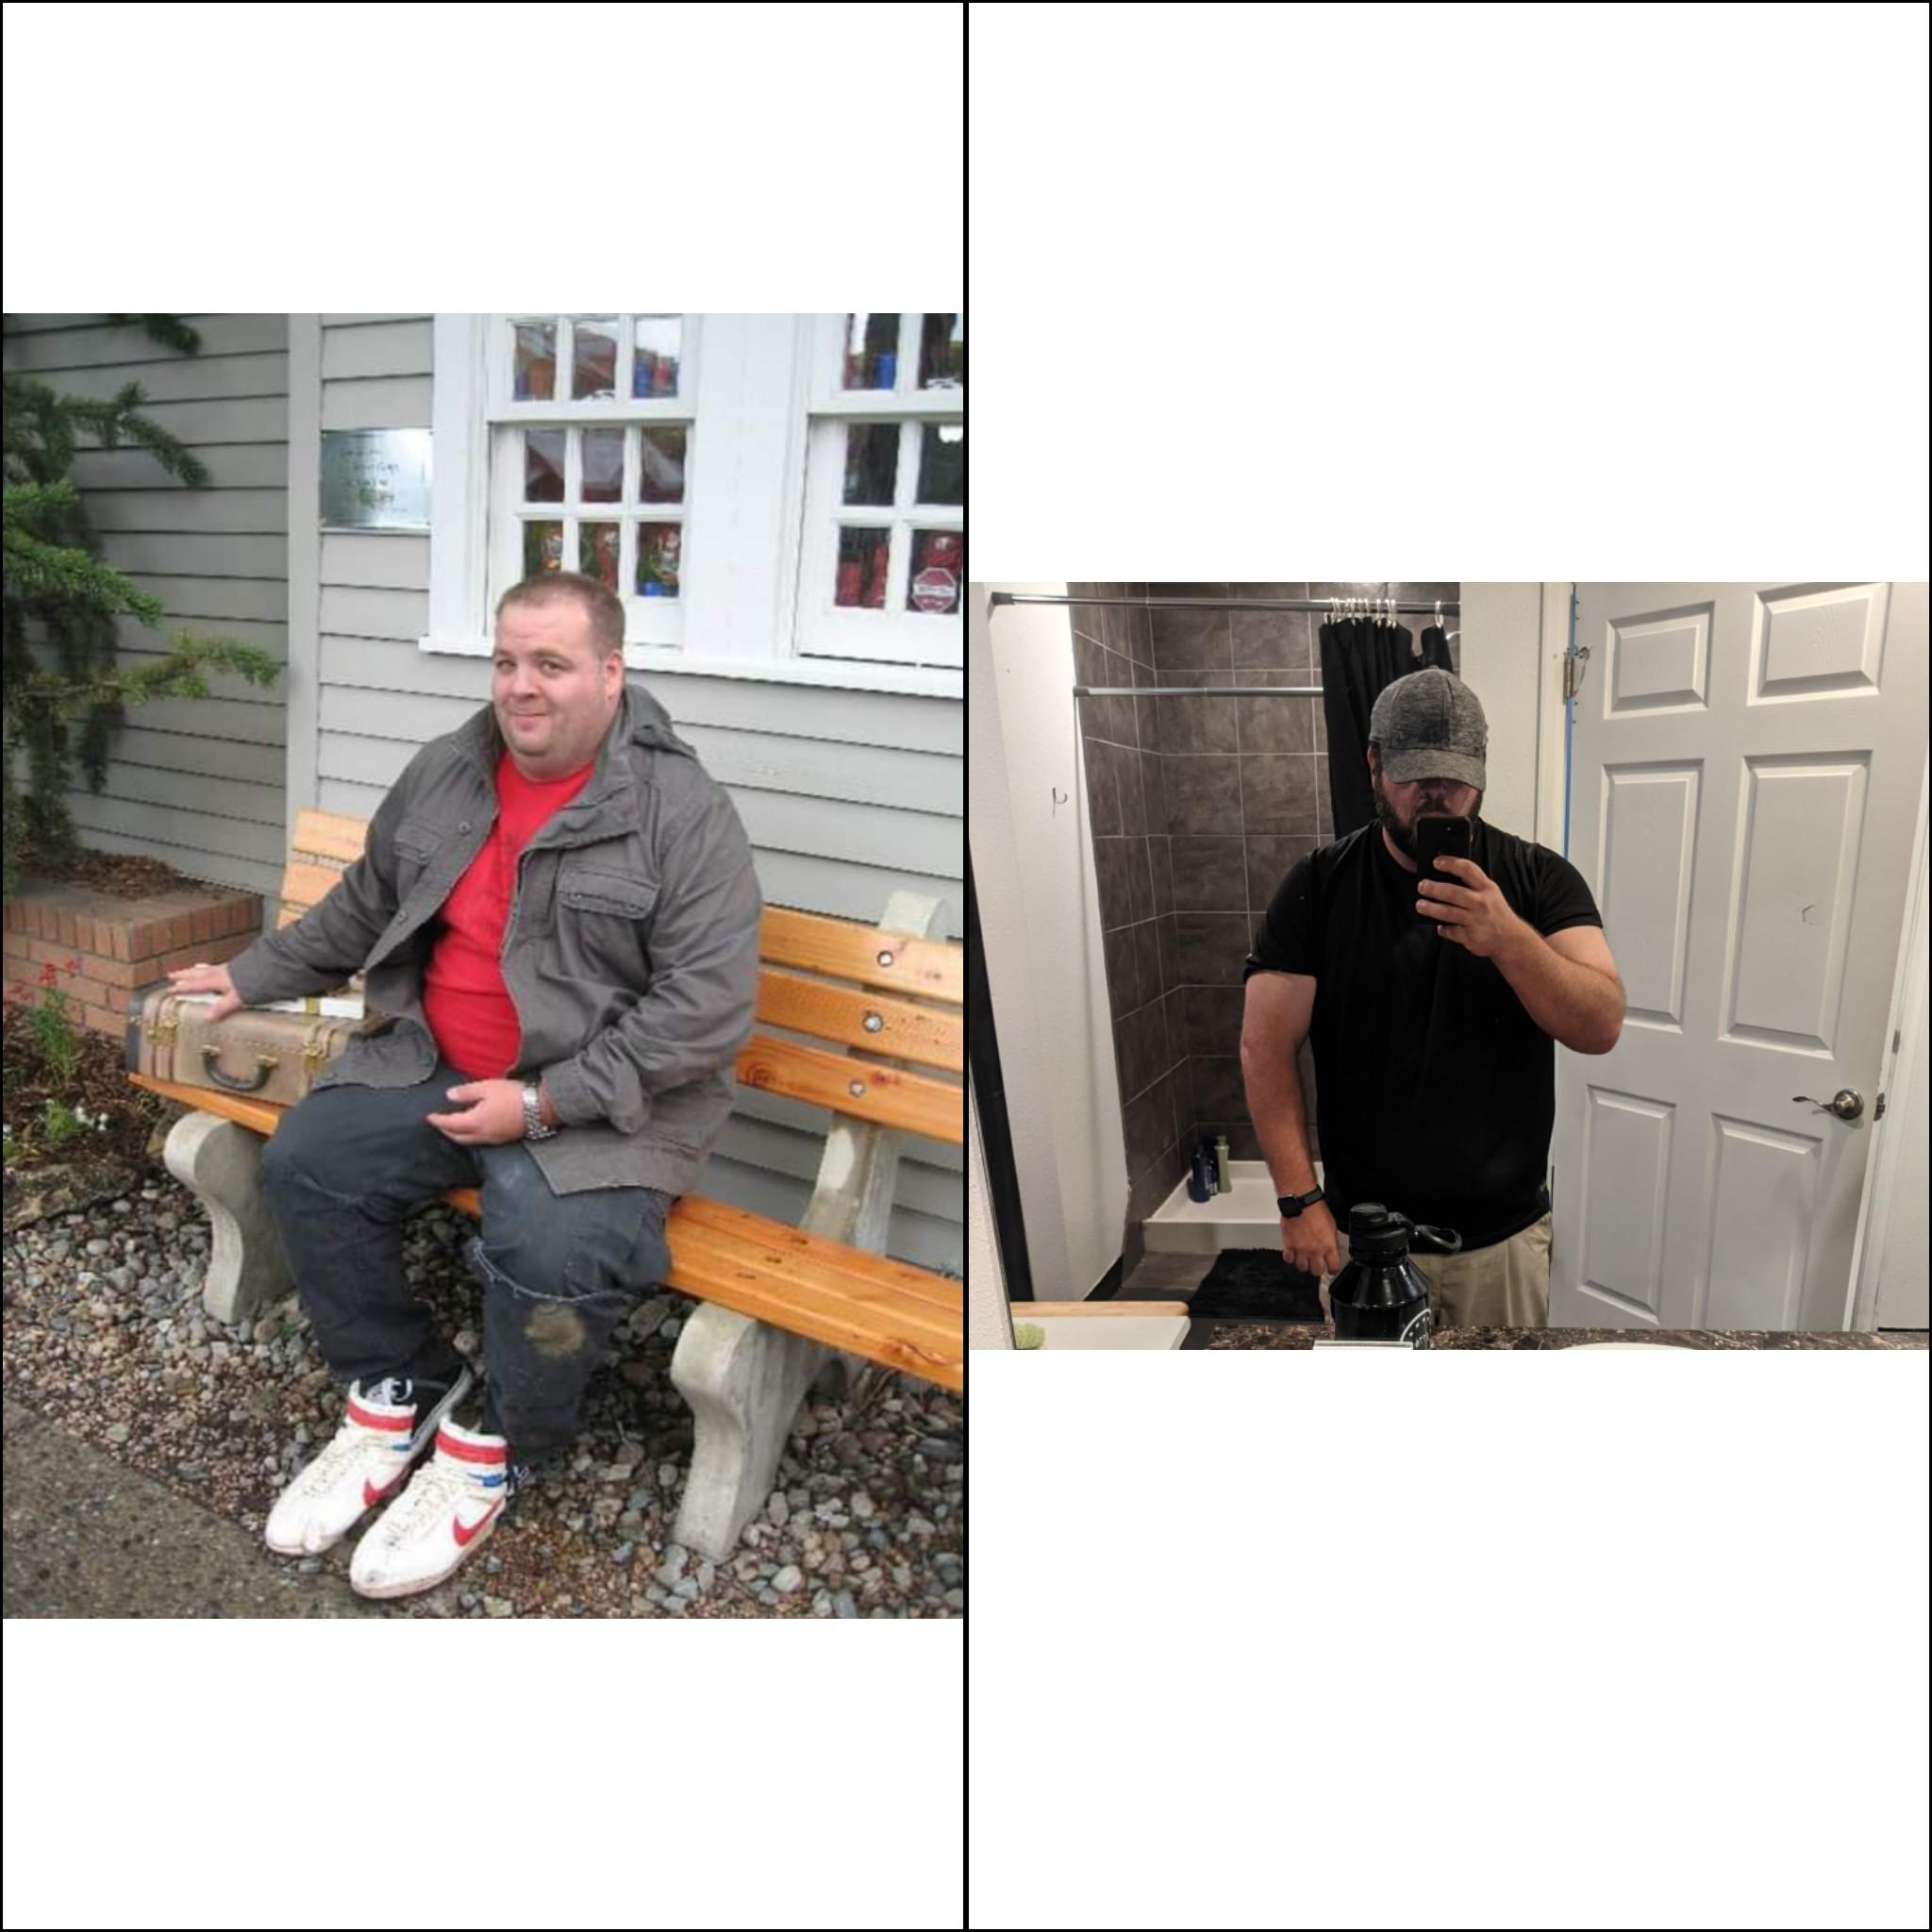 Progress Pics of 55 lbs Weight Loss 5 feet 11 Male 345 lbs to 290 lbs